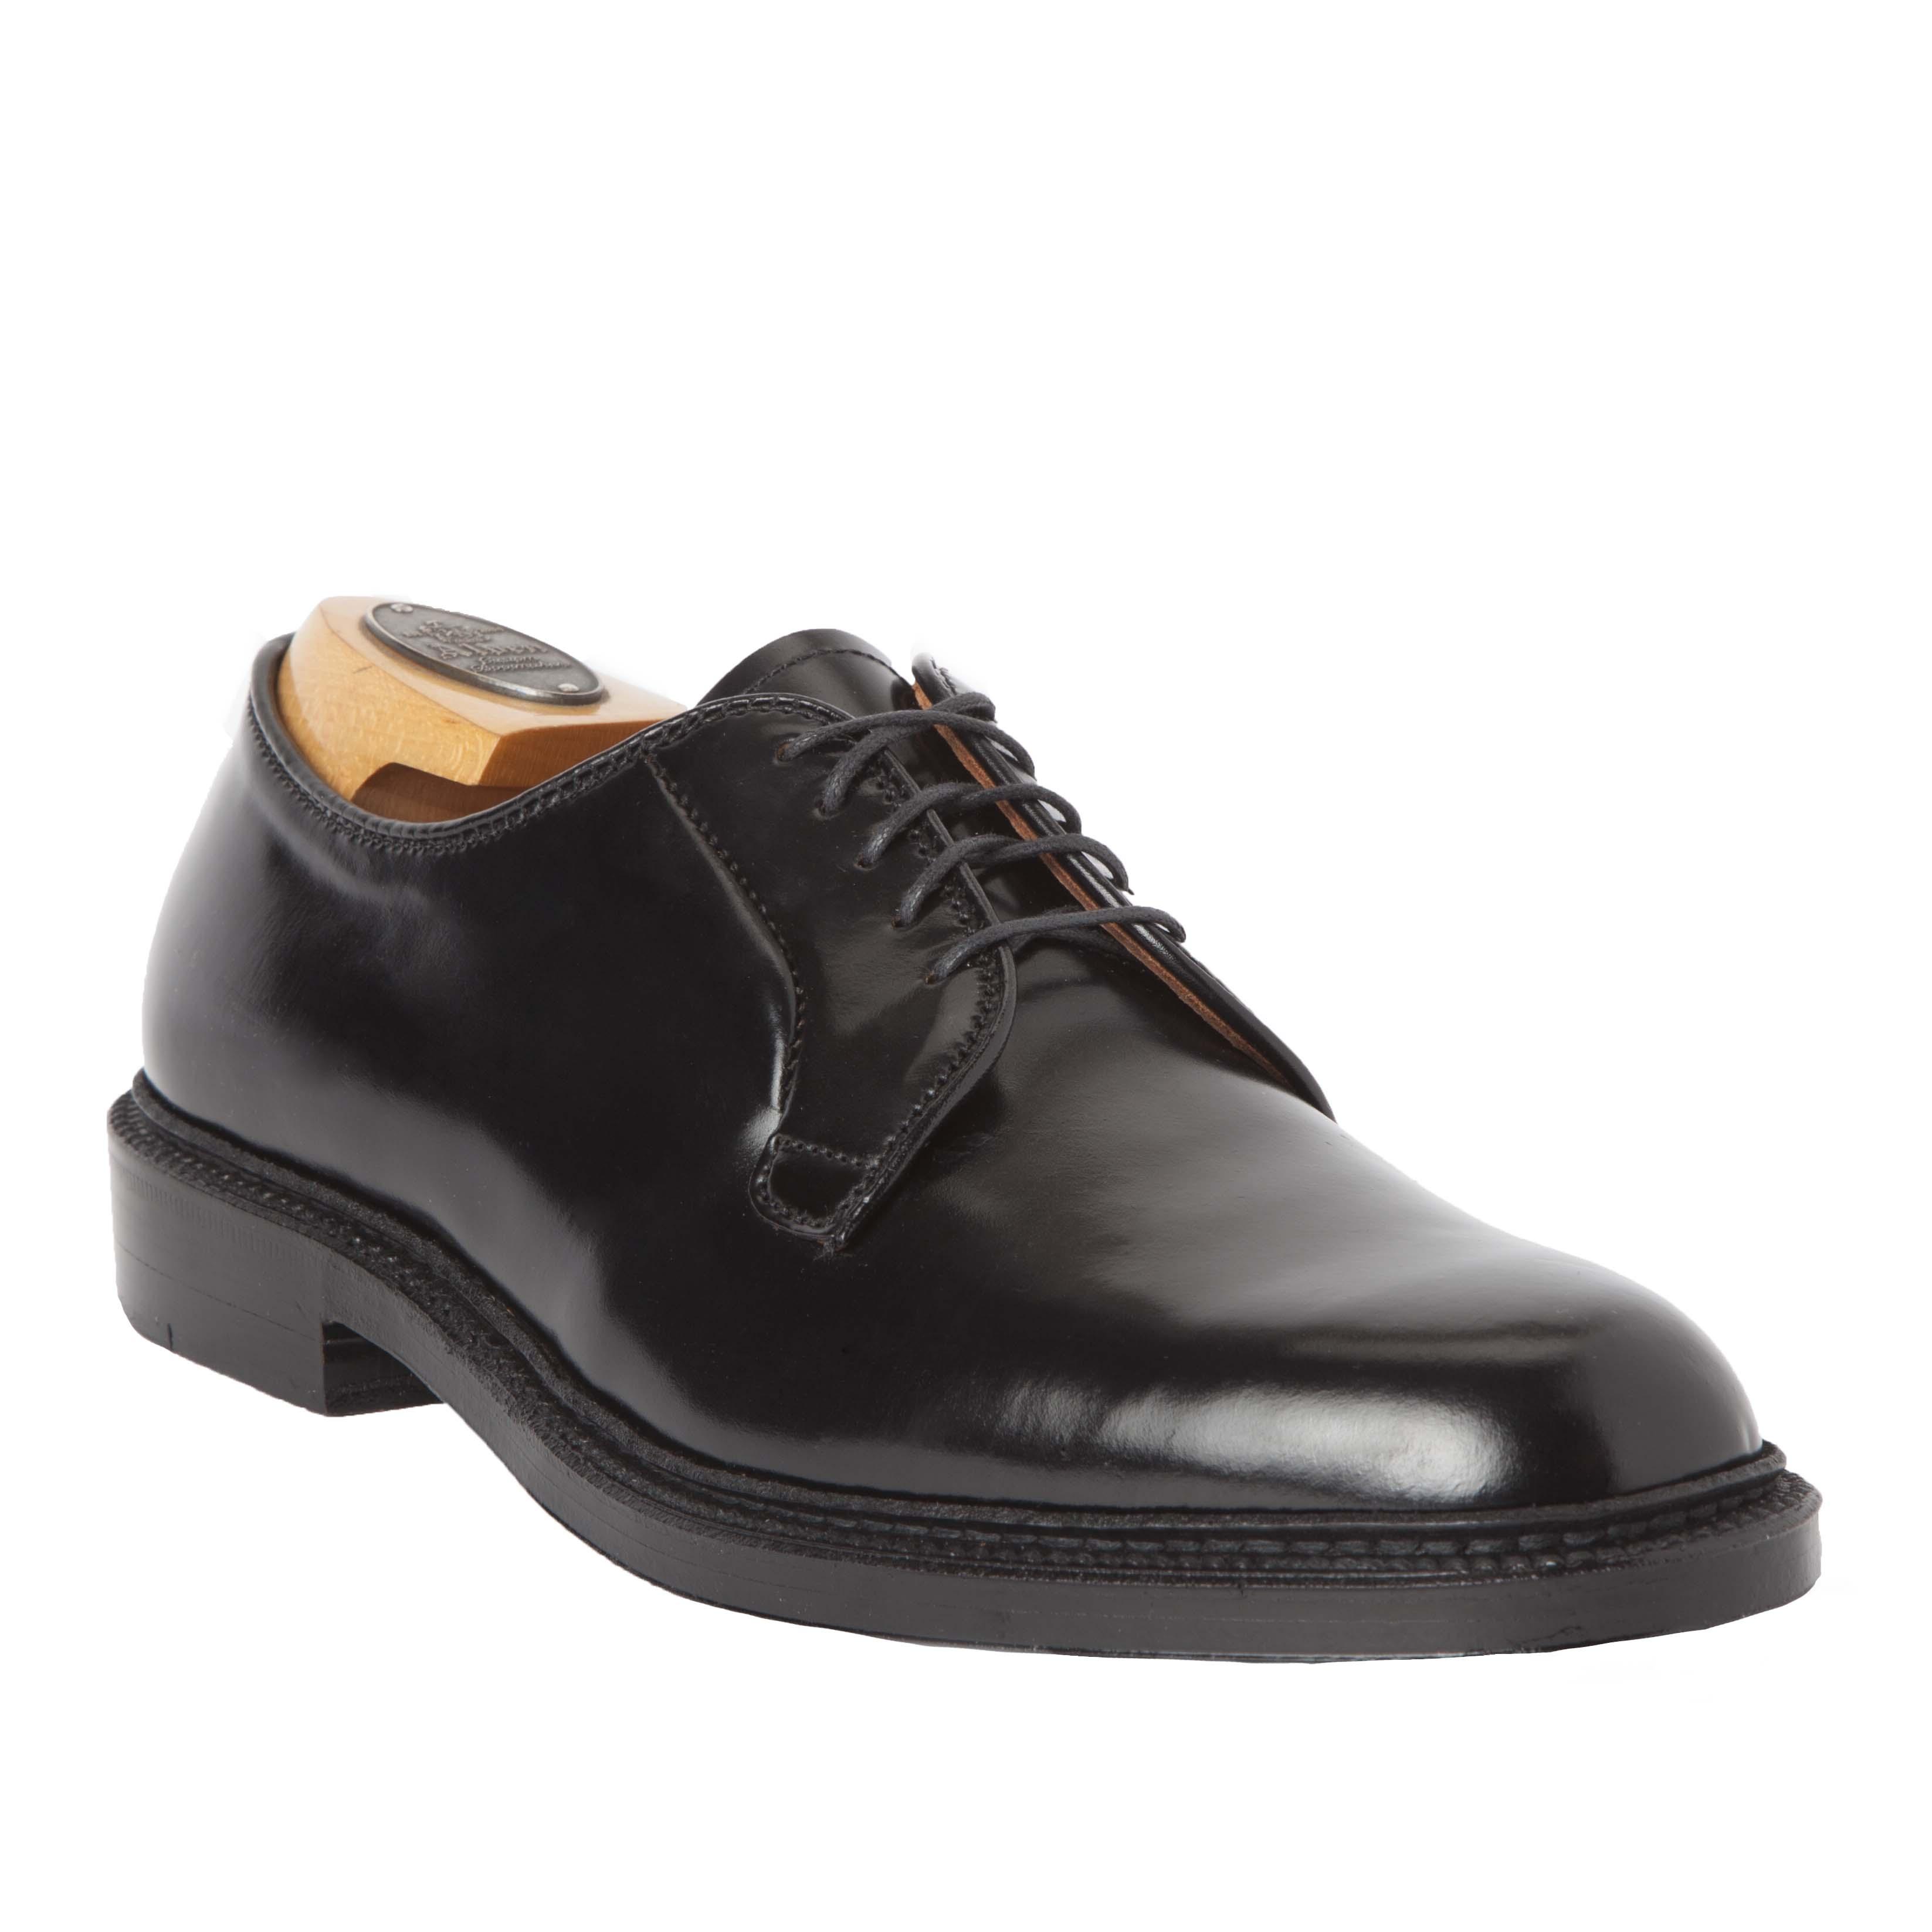 Plain toe blucherblack shell cordovan9901 alden shoes for The alden